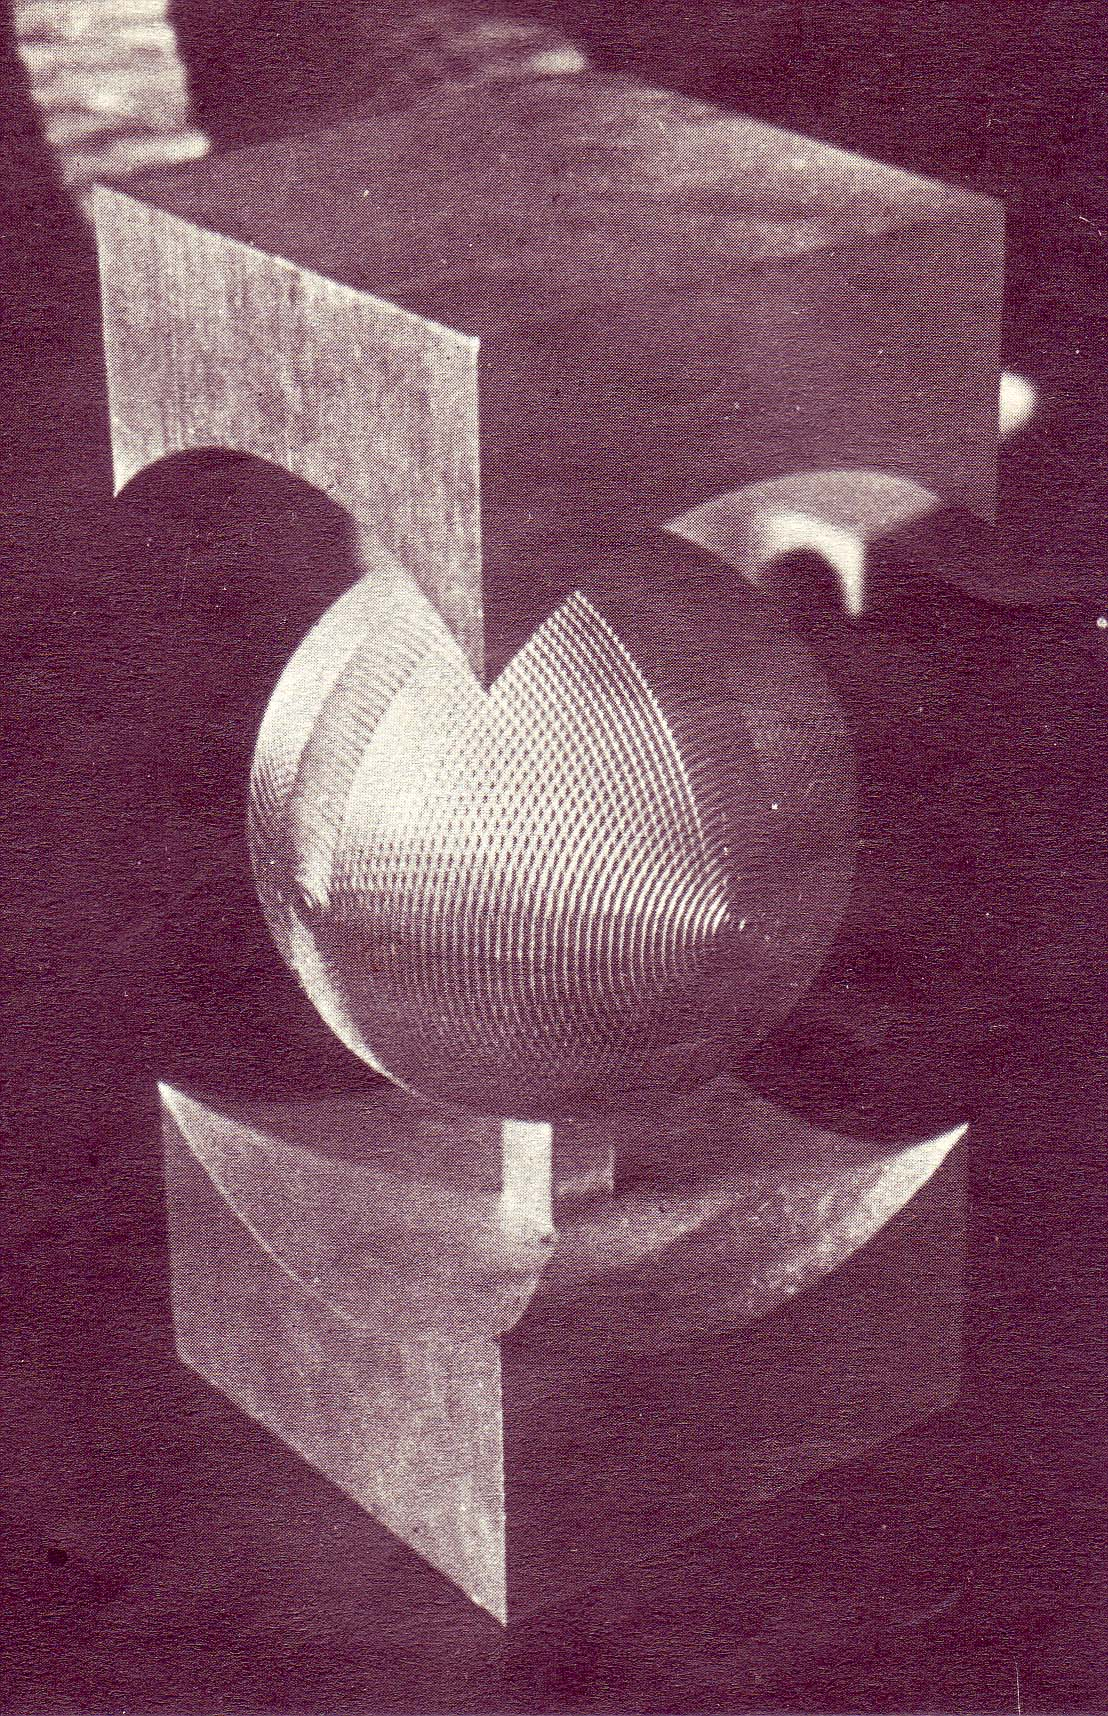 Sfera computer sculture, duraluminiu, foto Agerpres, 1986, Miniprocesor postprocesor, ADAPT OSIM